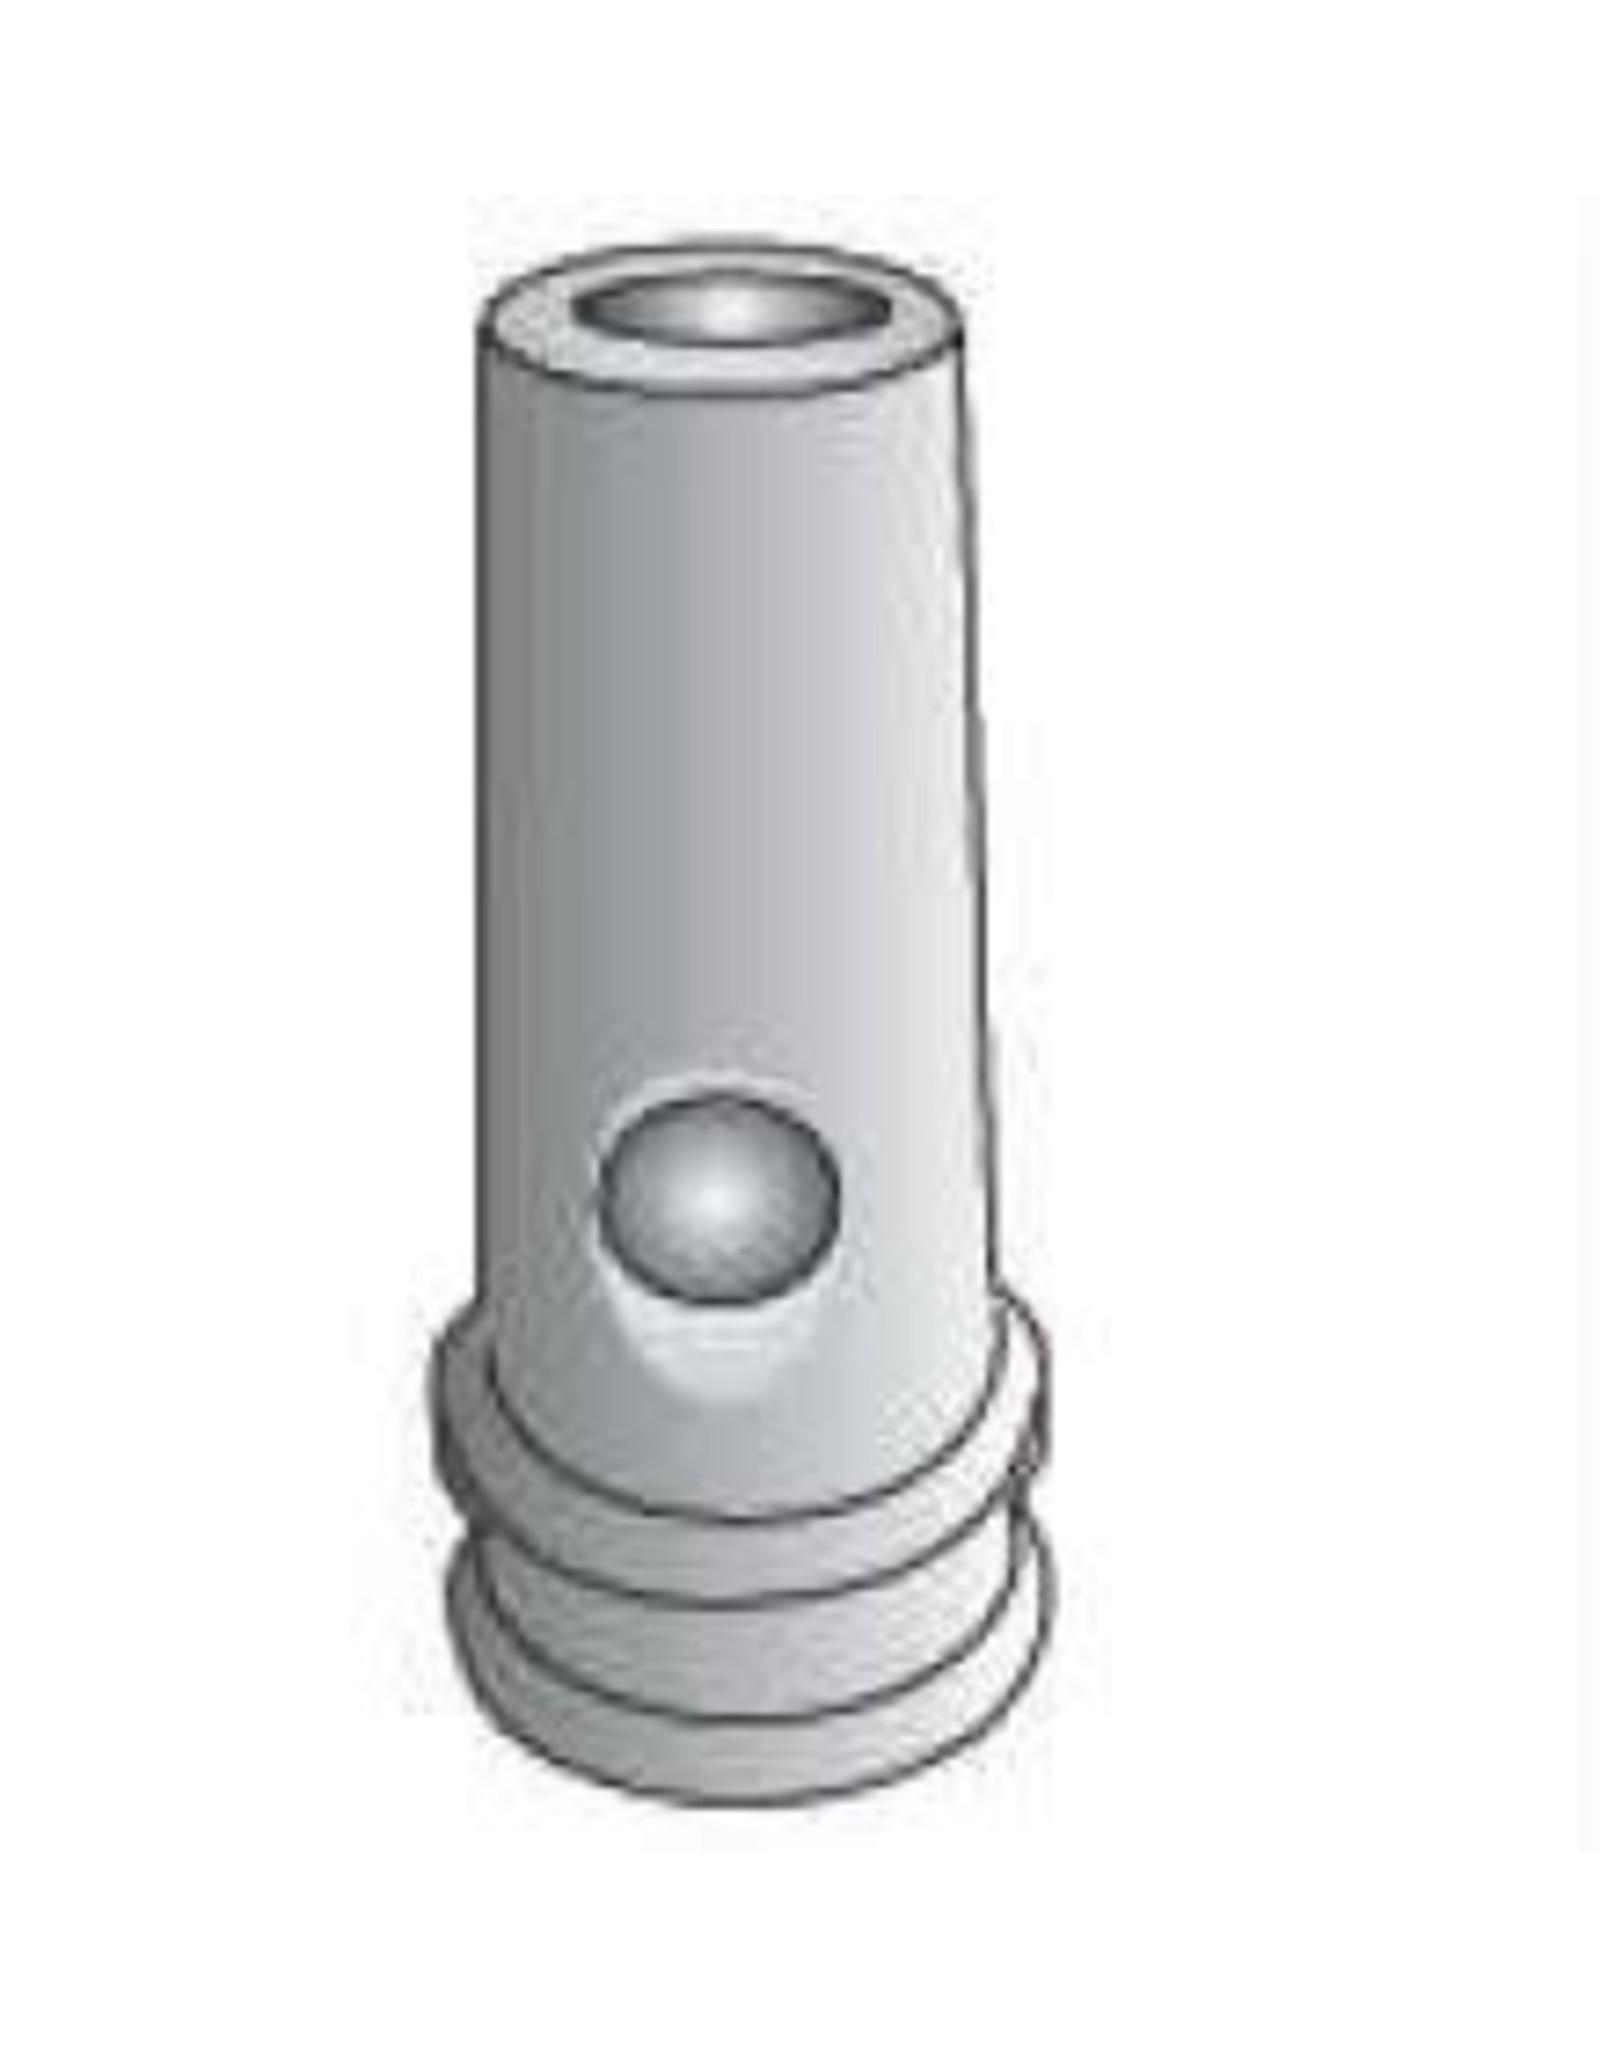 TM4 Handle connector upper part cone